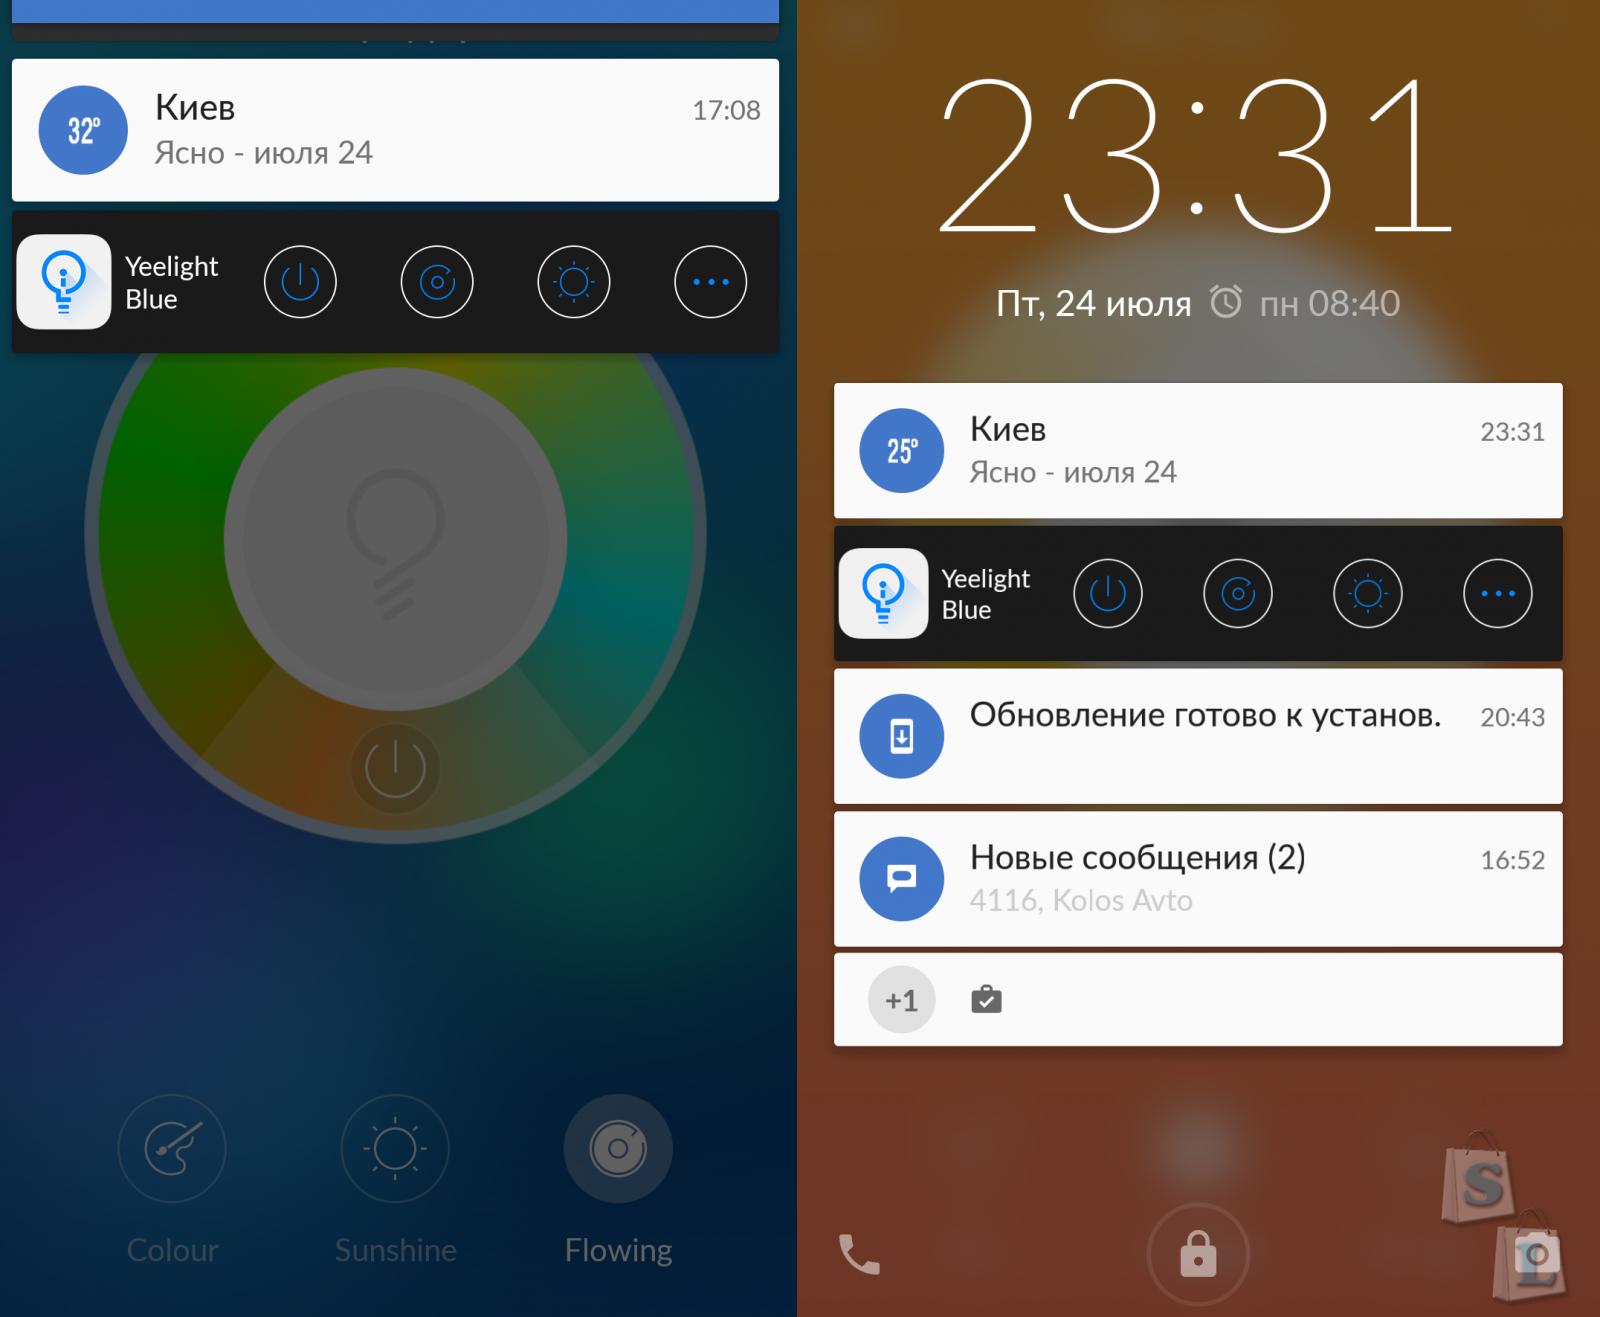 TinyDeal: Обзор Xiaomi Yeelight Mi light  - Bluetooth лампа  или меняй свет и цвет со смартфона E27 6W